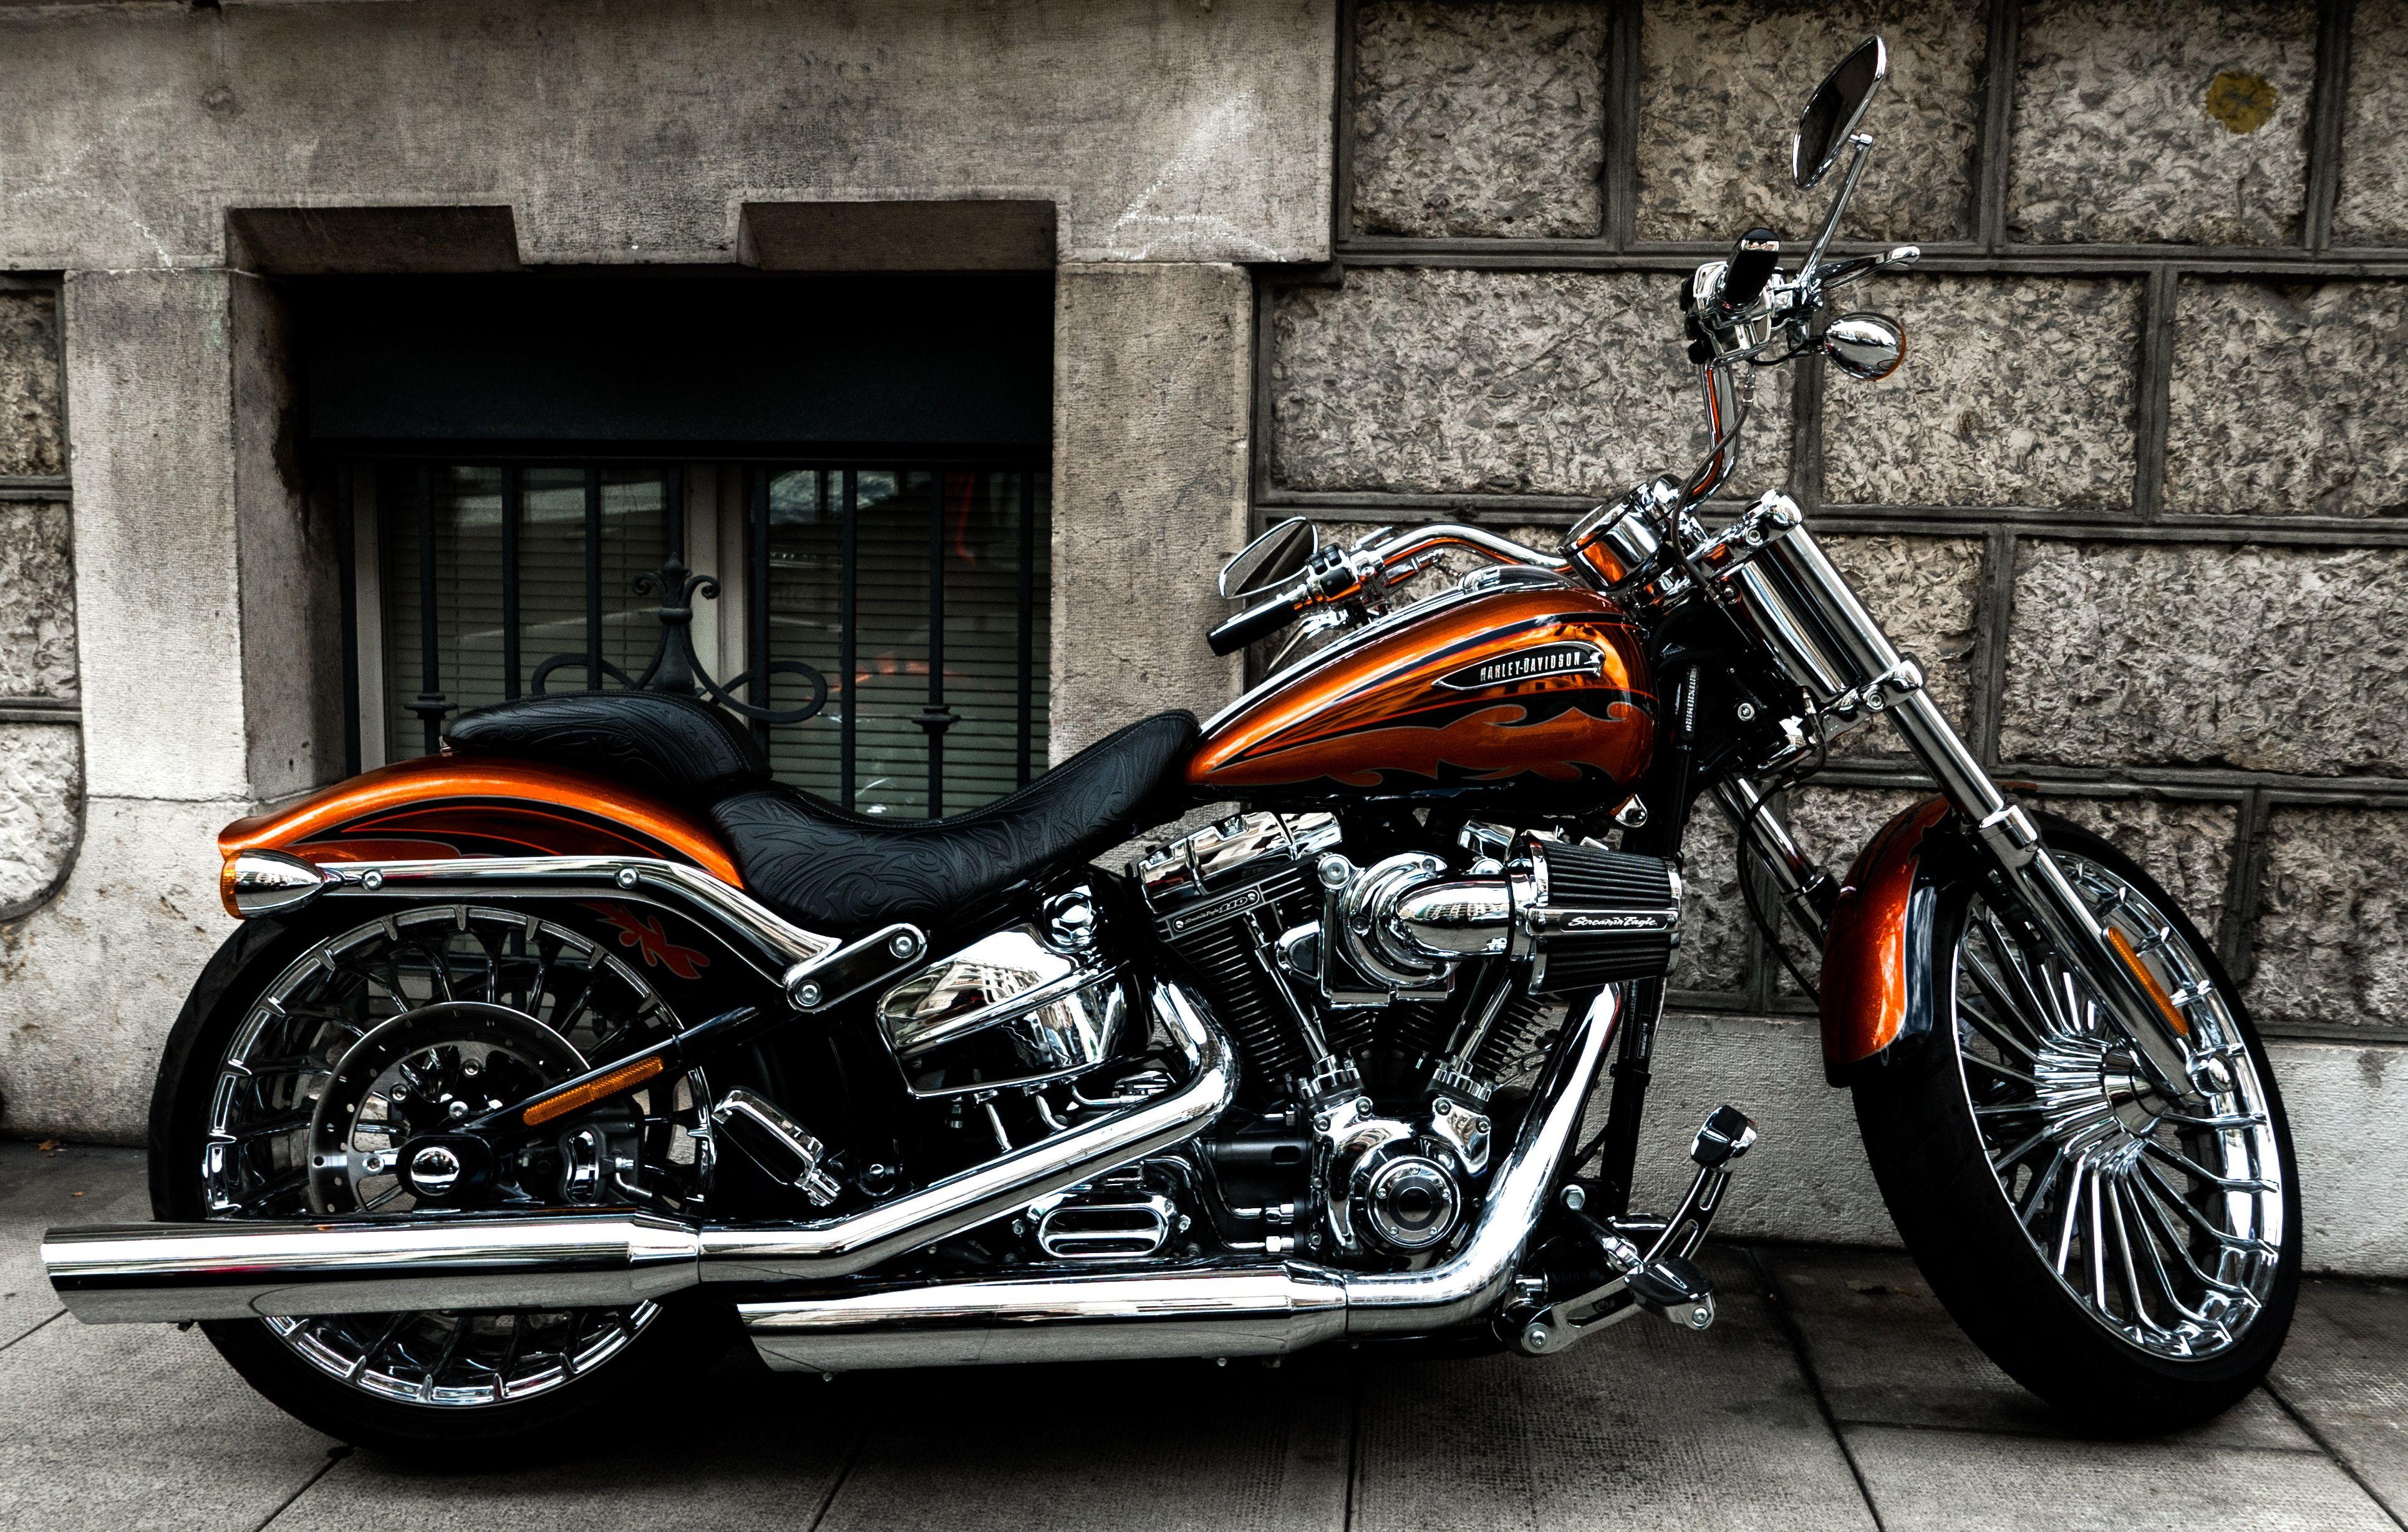 Harley Davidson Brown And Black Cruiser Motorcycle Graceful